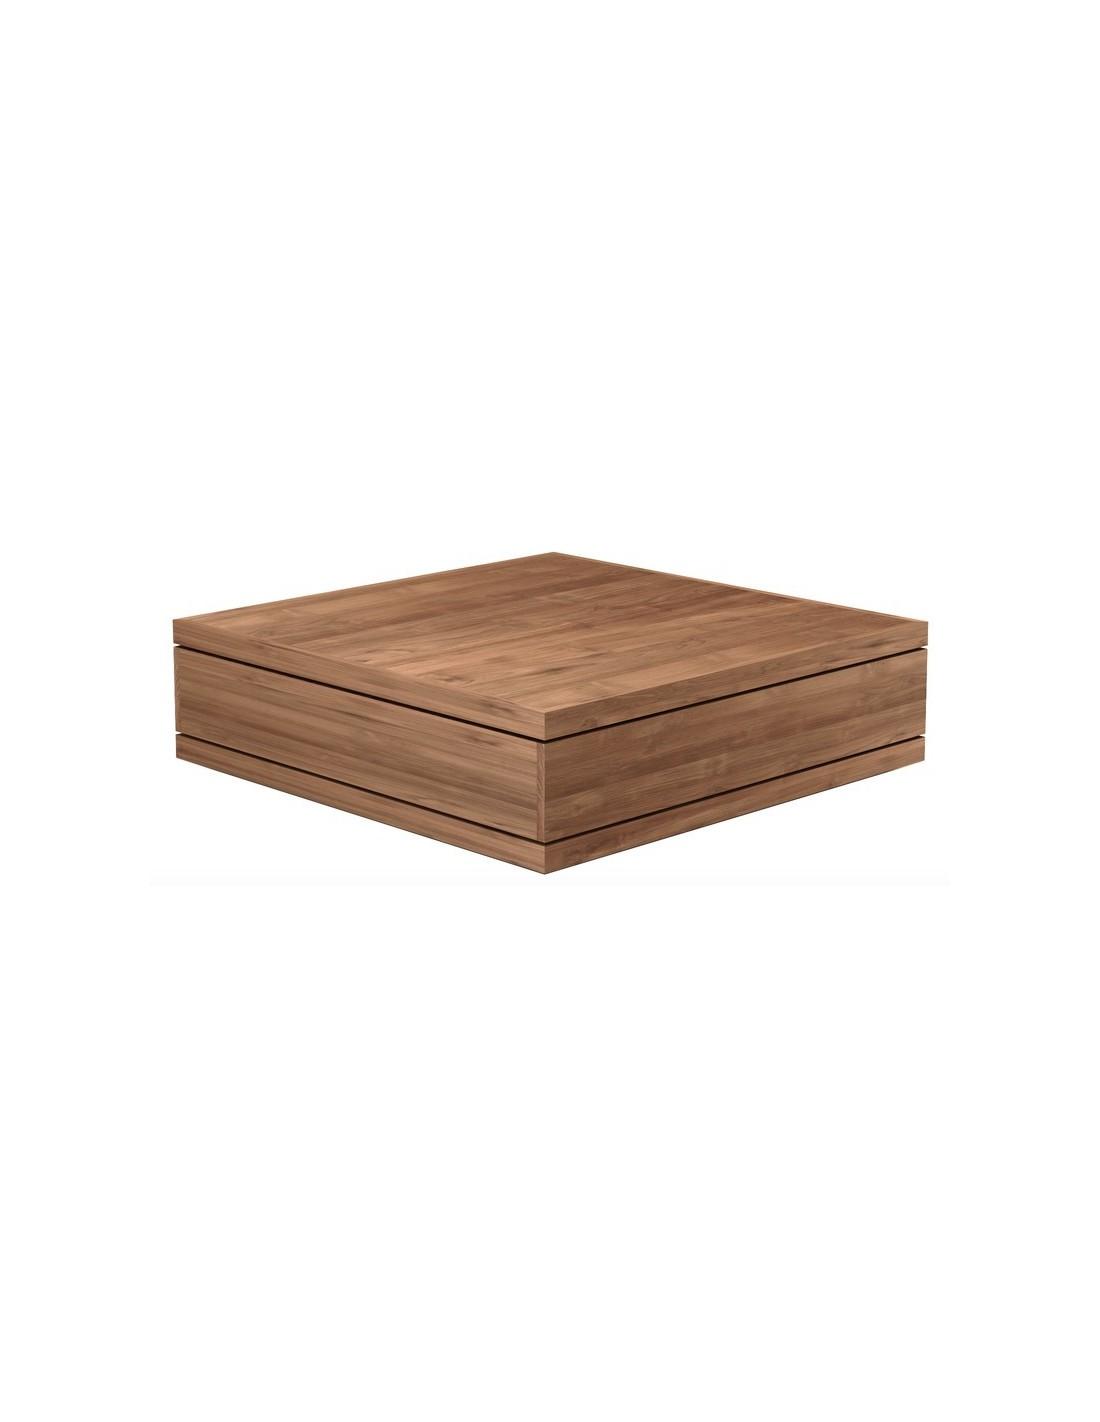 Teck Burger - table basse - 2 tiroirs -110-110-32cm